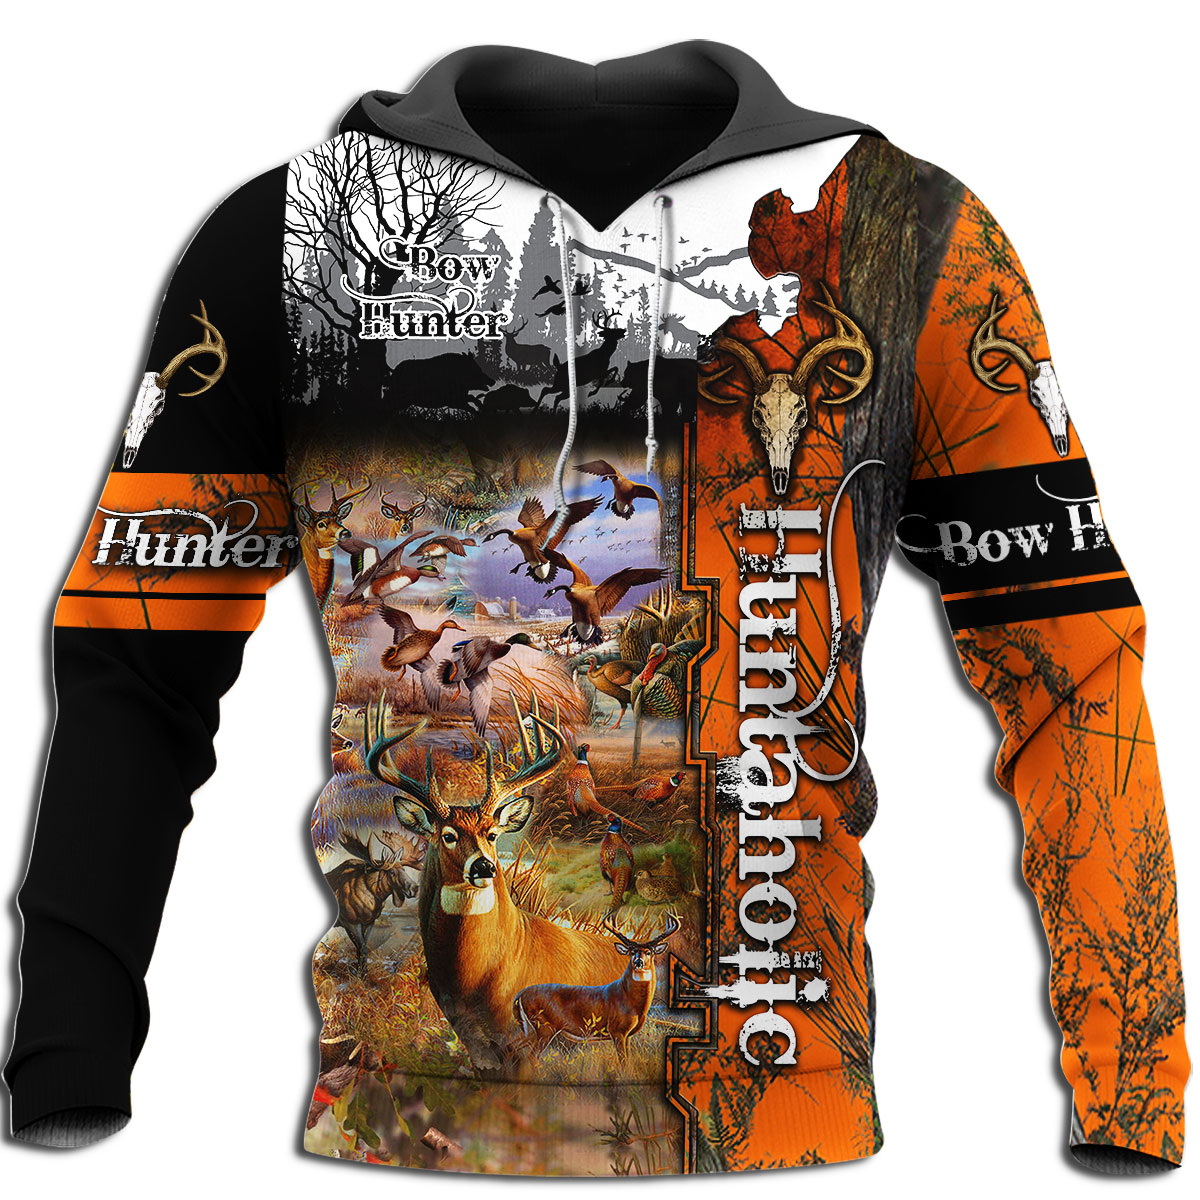 Deer Hunting Camo 3D Print Men Hoodies/sweatshirt Harajuku Fashion Hooded Long Sleeve Pullovers Unisex streetwear YY-668